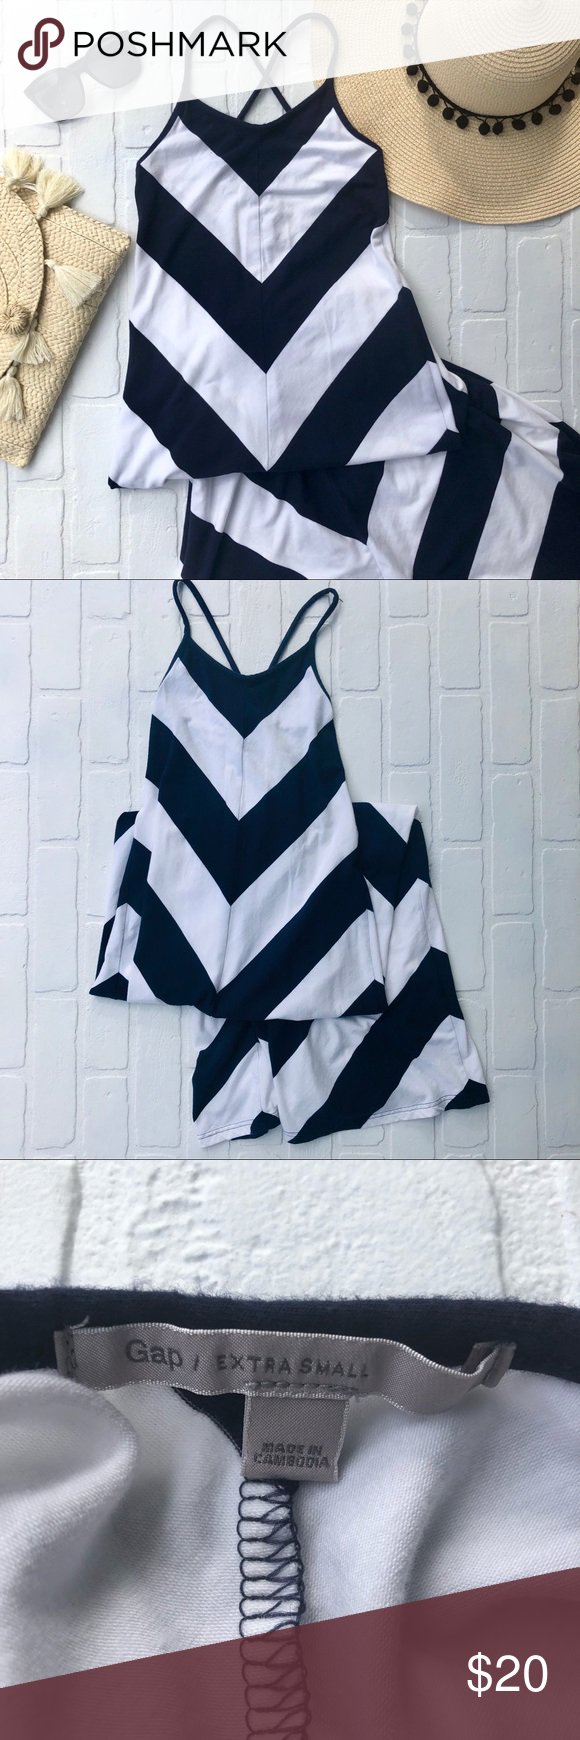 Gap Maxi Dress Navy Blue And White Xs Blue White Maxi Dress Maxi Dress Navy Gap Maxi Dress [ 1740 x 580 Pixel ]